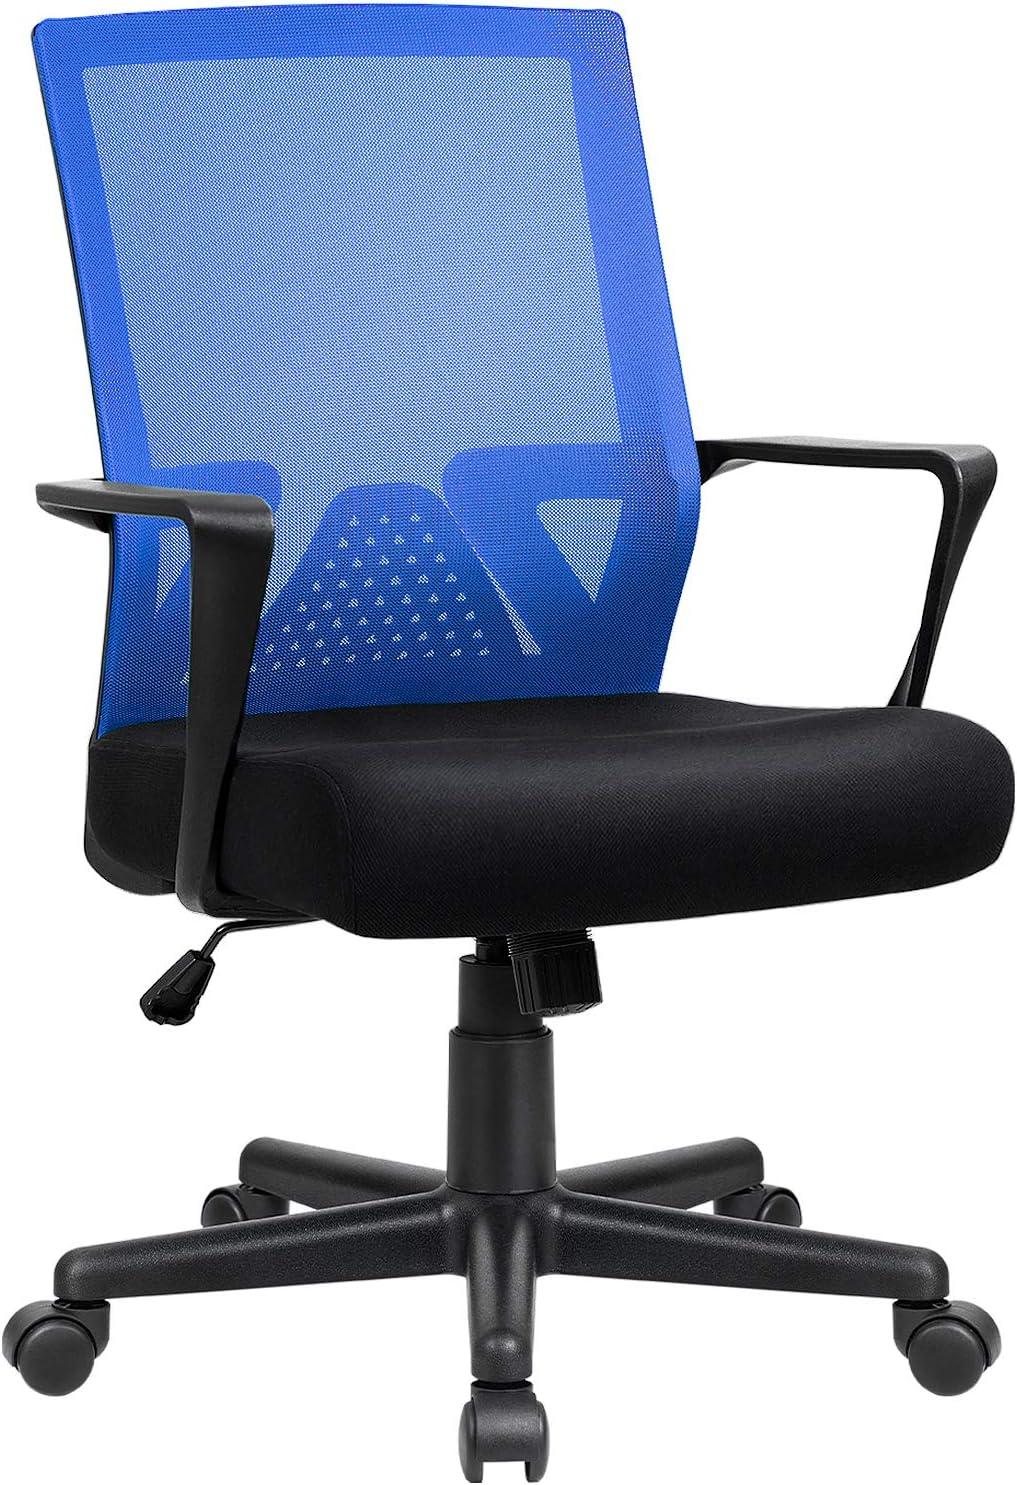 Furniwell Office Chair Ergonomic Desk Chair Mid Back Modern Computer Chair Task Swivel Chair Mesh Adjustable Chair with Lumbar Support Armrest (Blue)